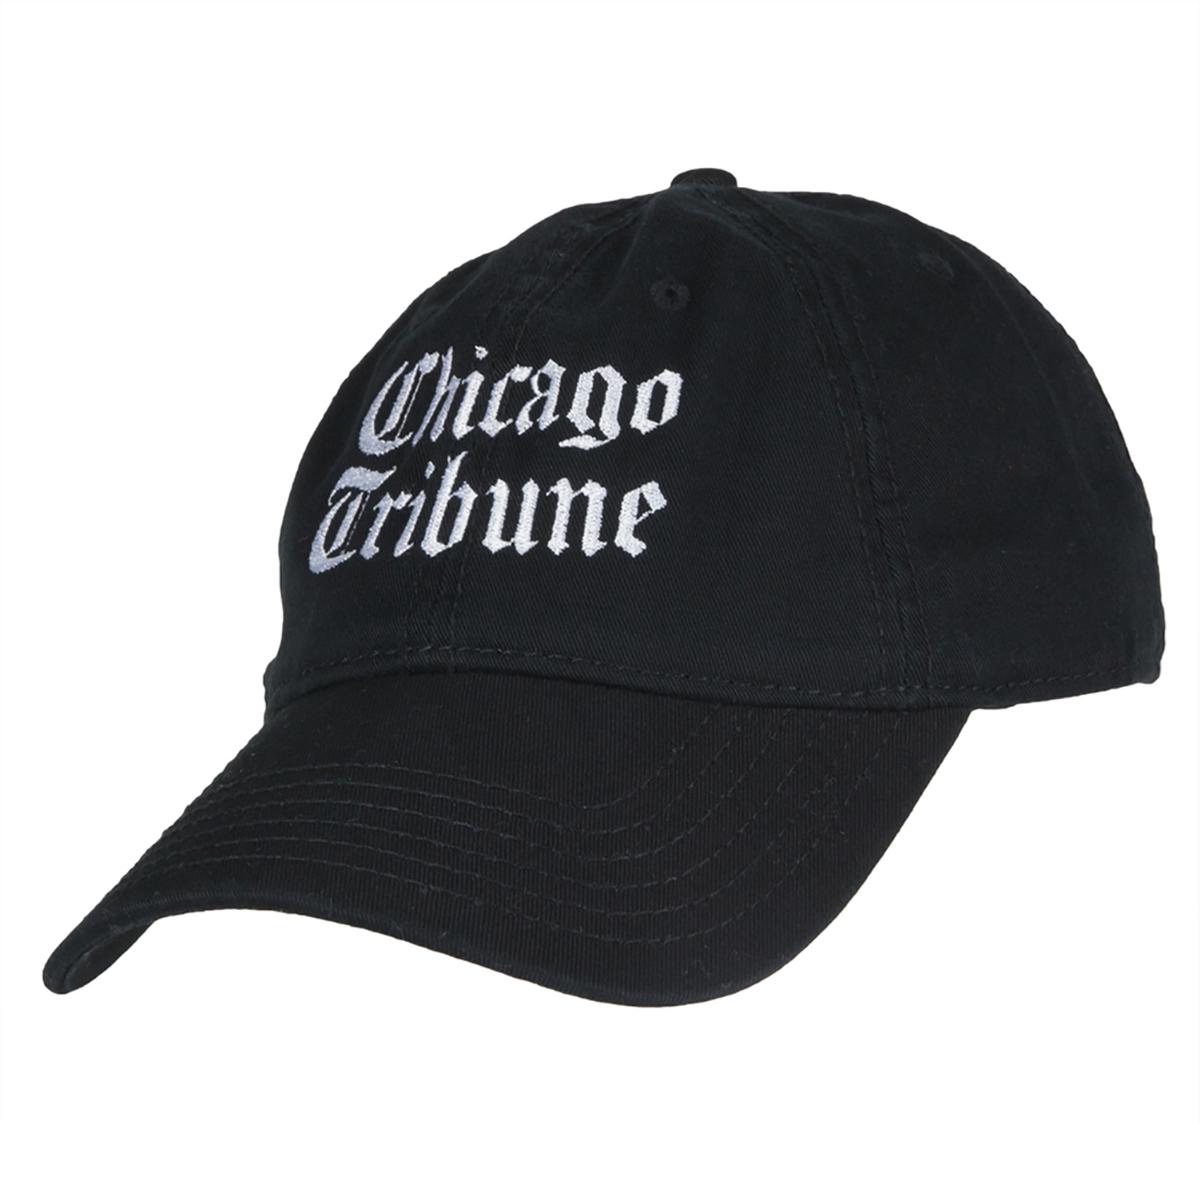 Chicago Tribune Stacked Logo Black Adjustable Cap